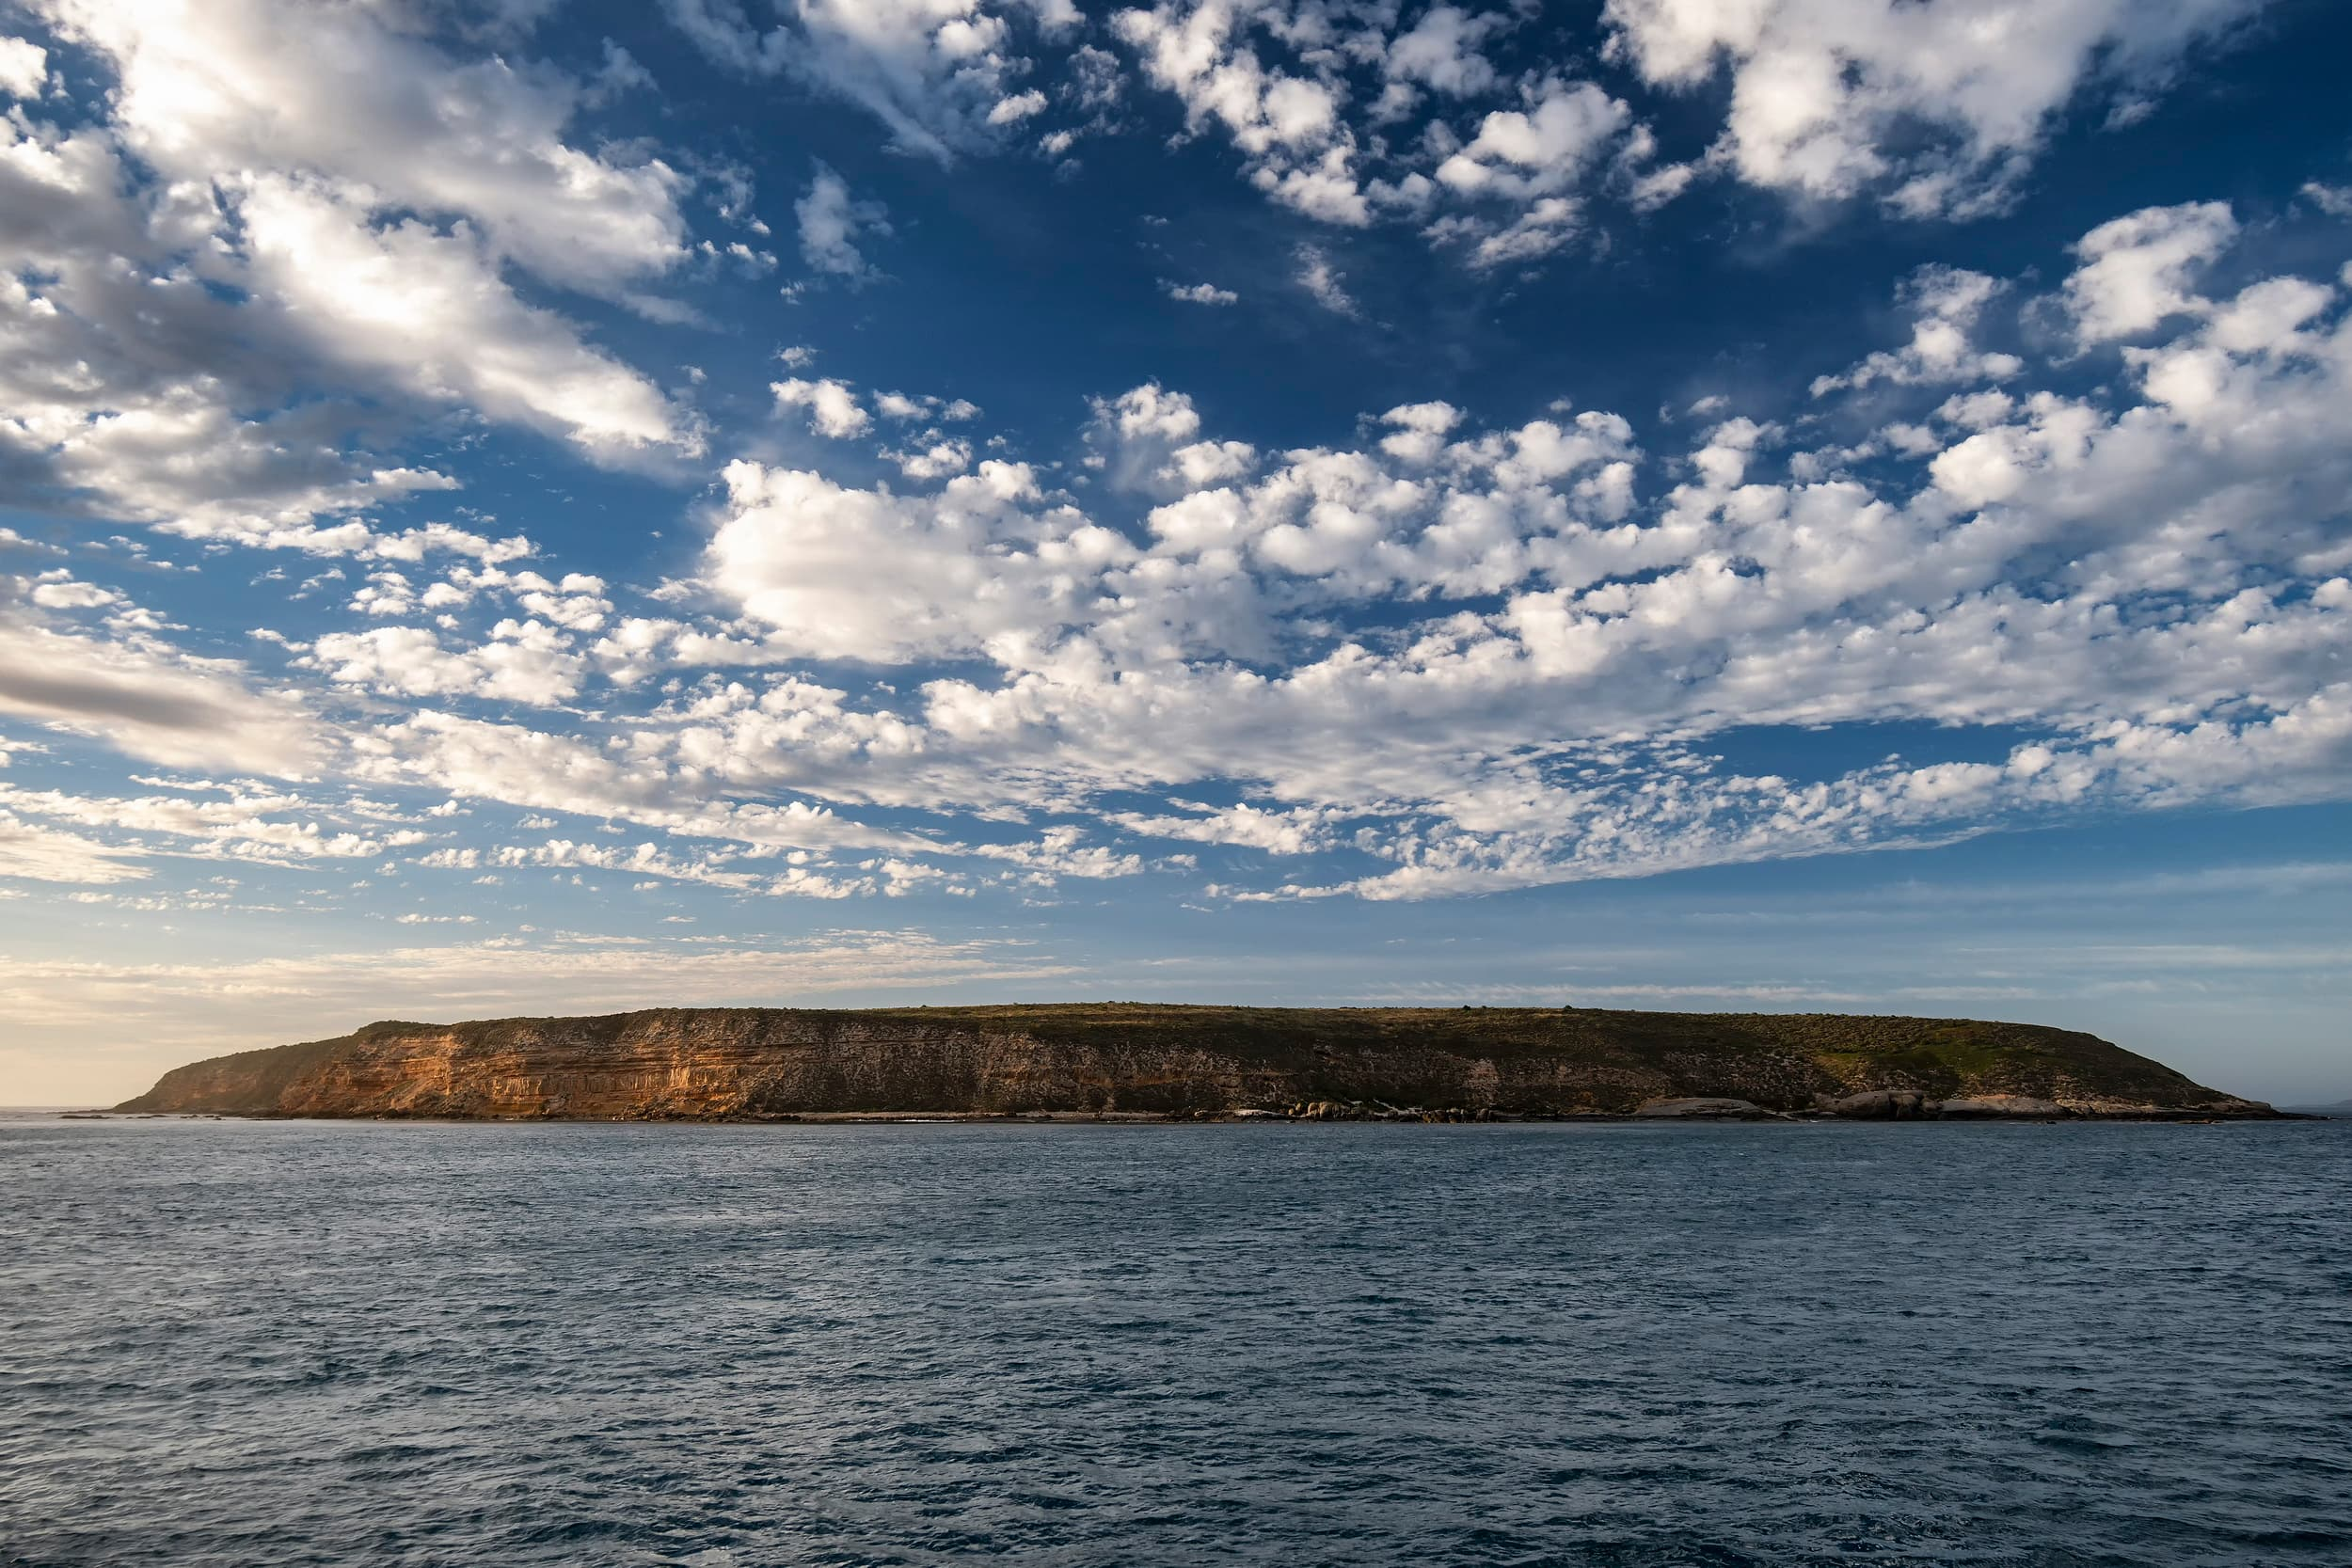 South Australias epic scenery